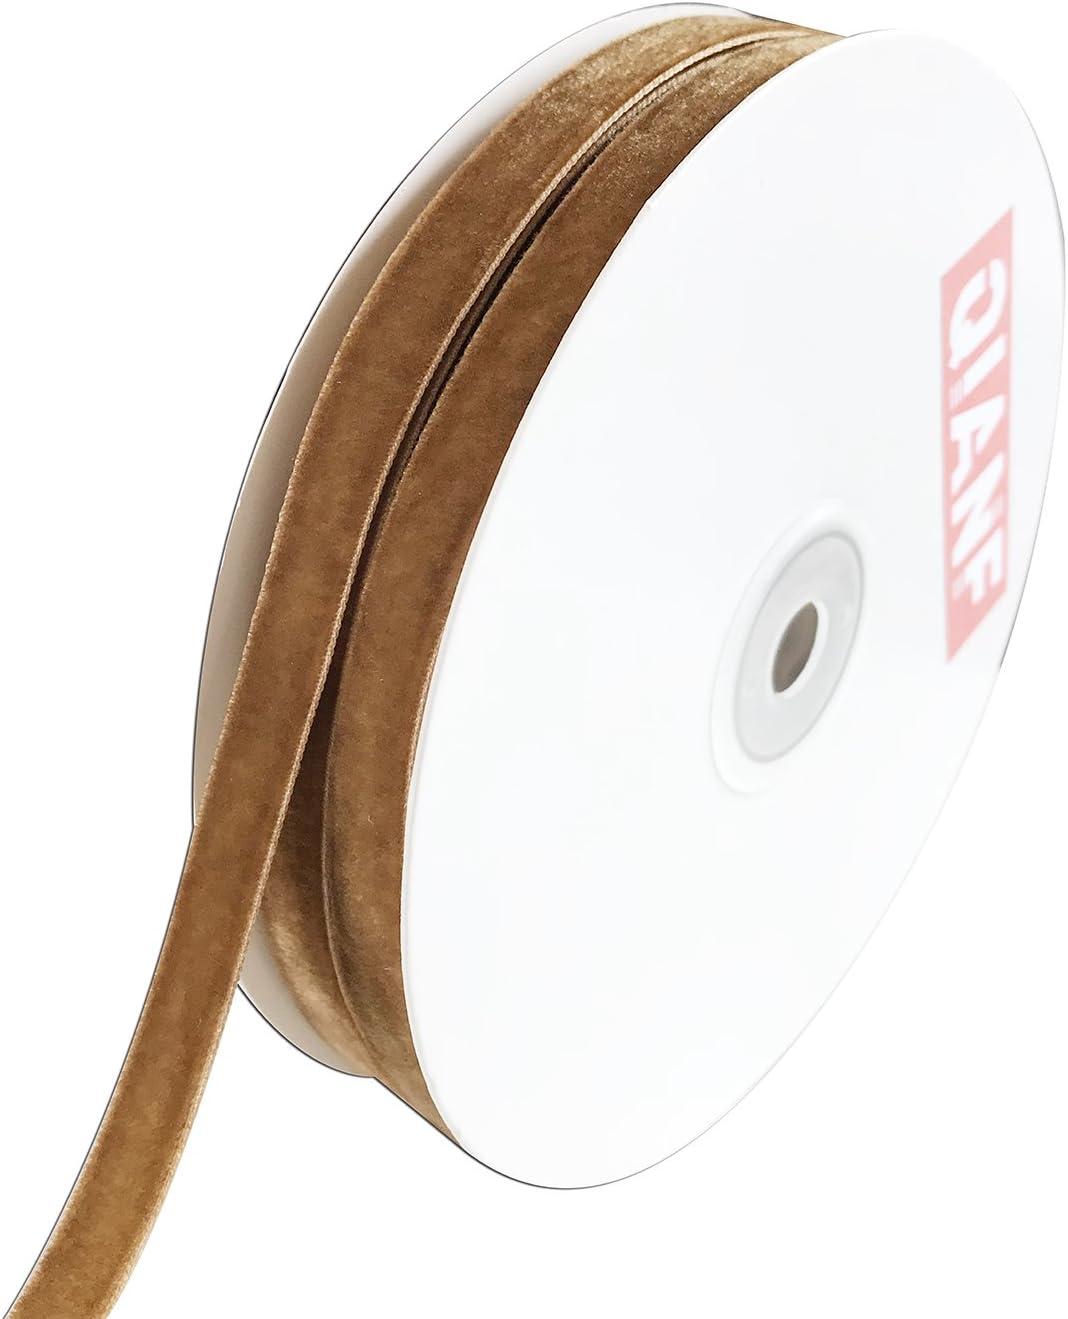 QIANF Velvet Ribbon White 1 1//2-Inch by 25-Yard Spool